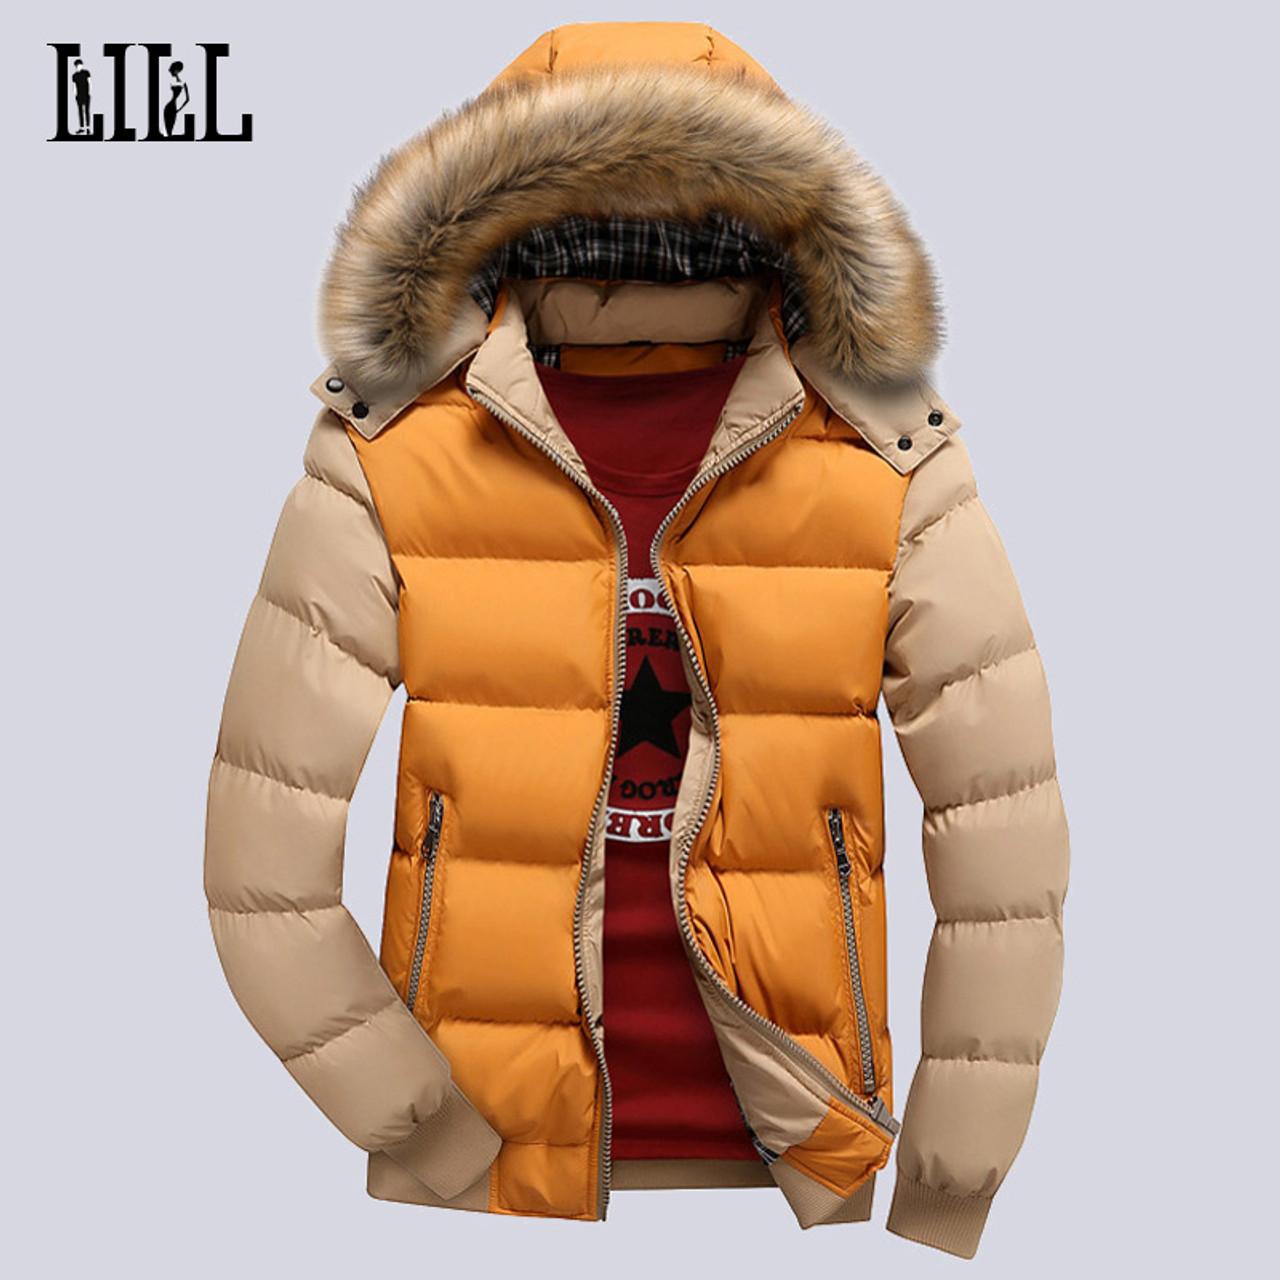 f7a3d7deac50 ... 9 Color Fashion Brand Winter Men's Down Jacket With Fur Hood Hat Slim  Men Outwear Coat ...